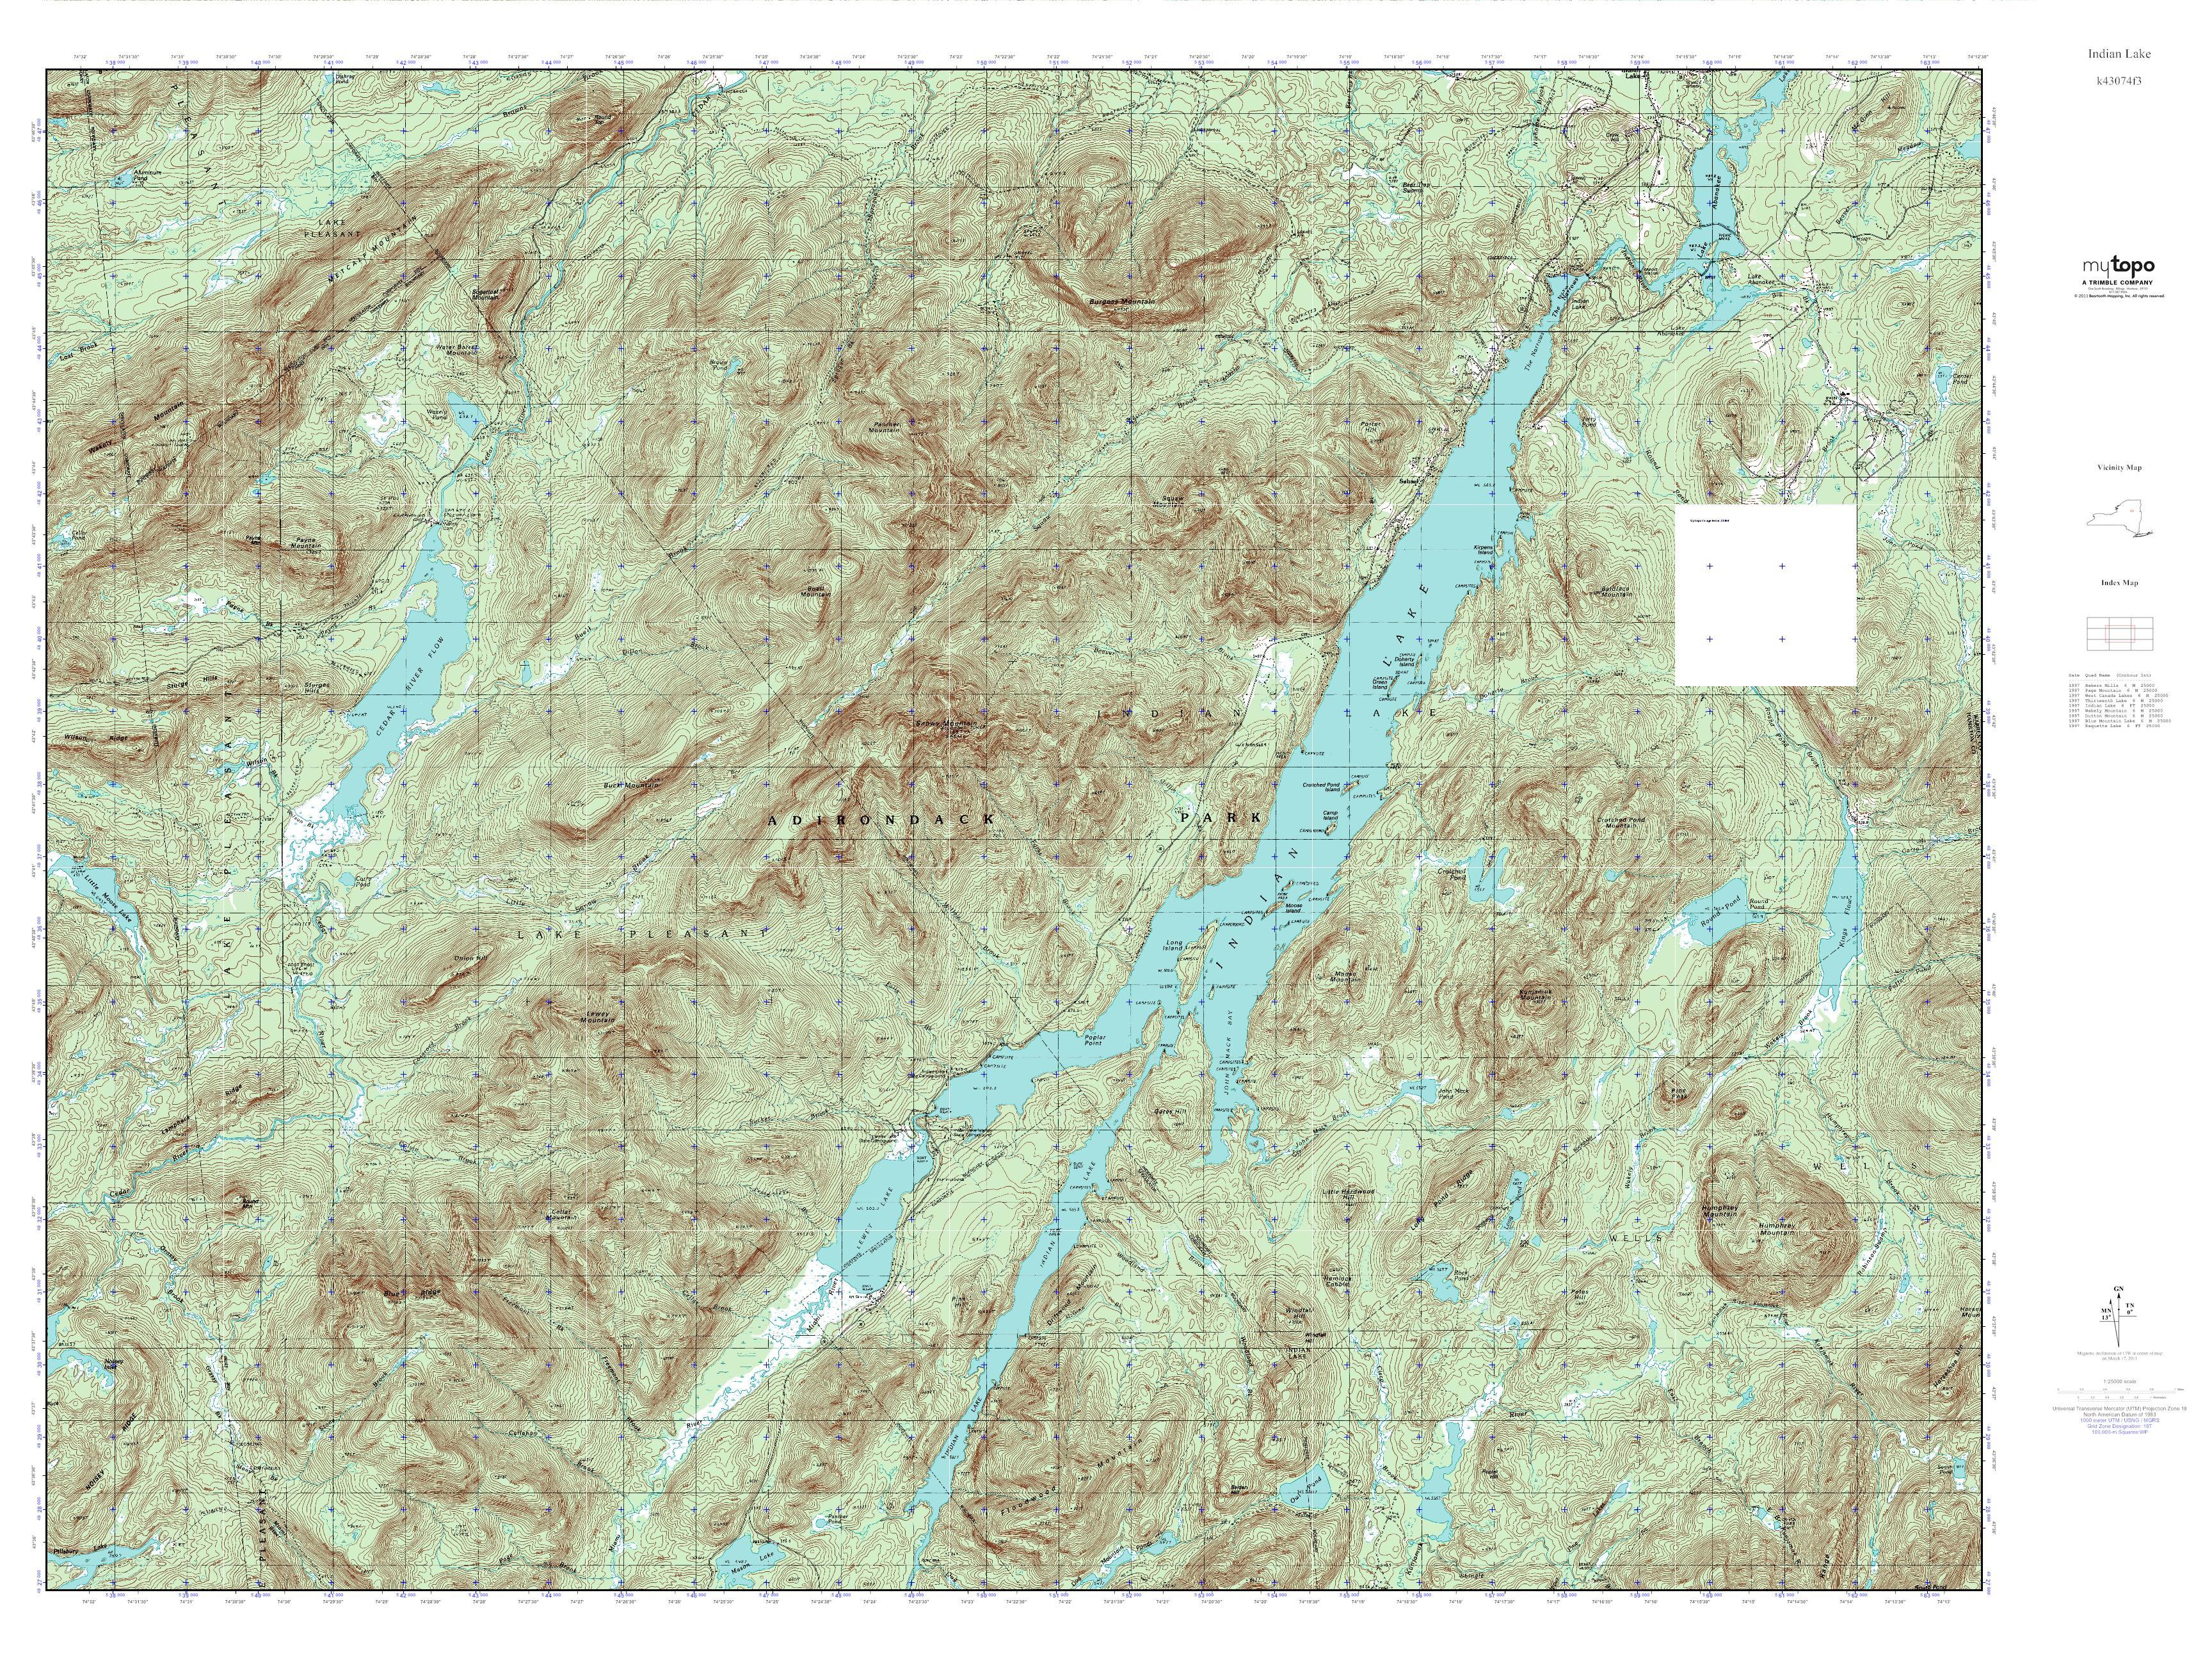 Mytopo Indian Lake New York Usgs Quad Topo Map